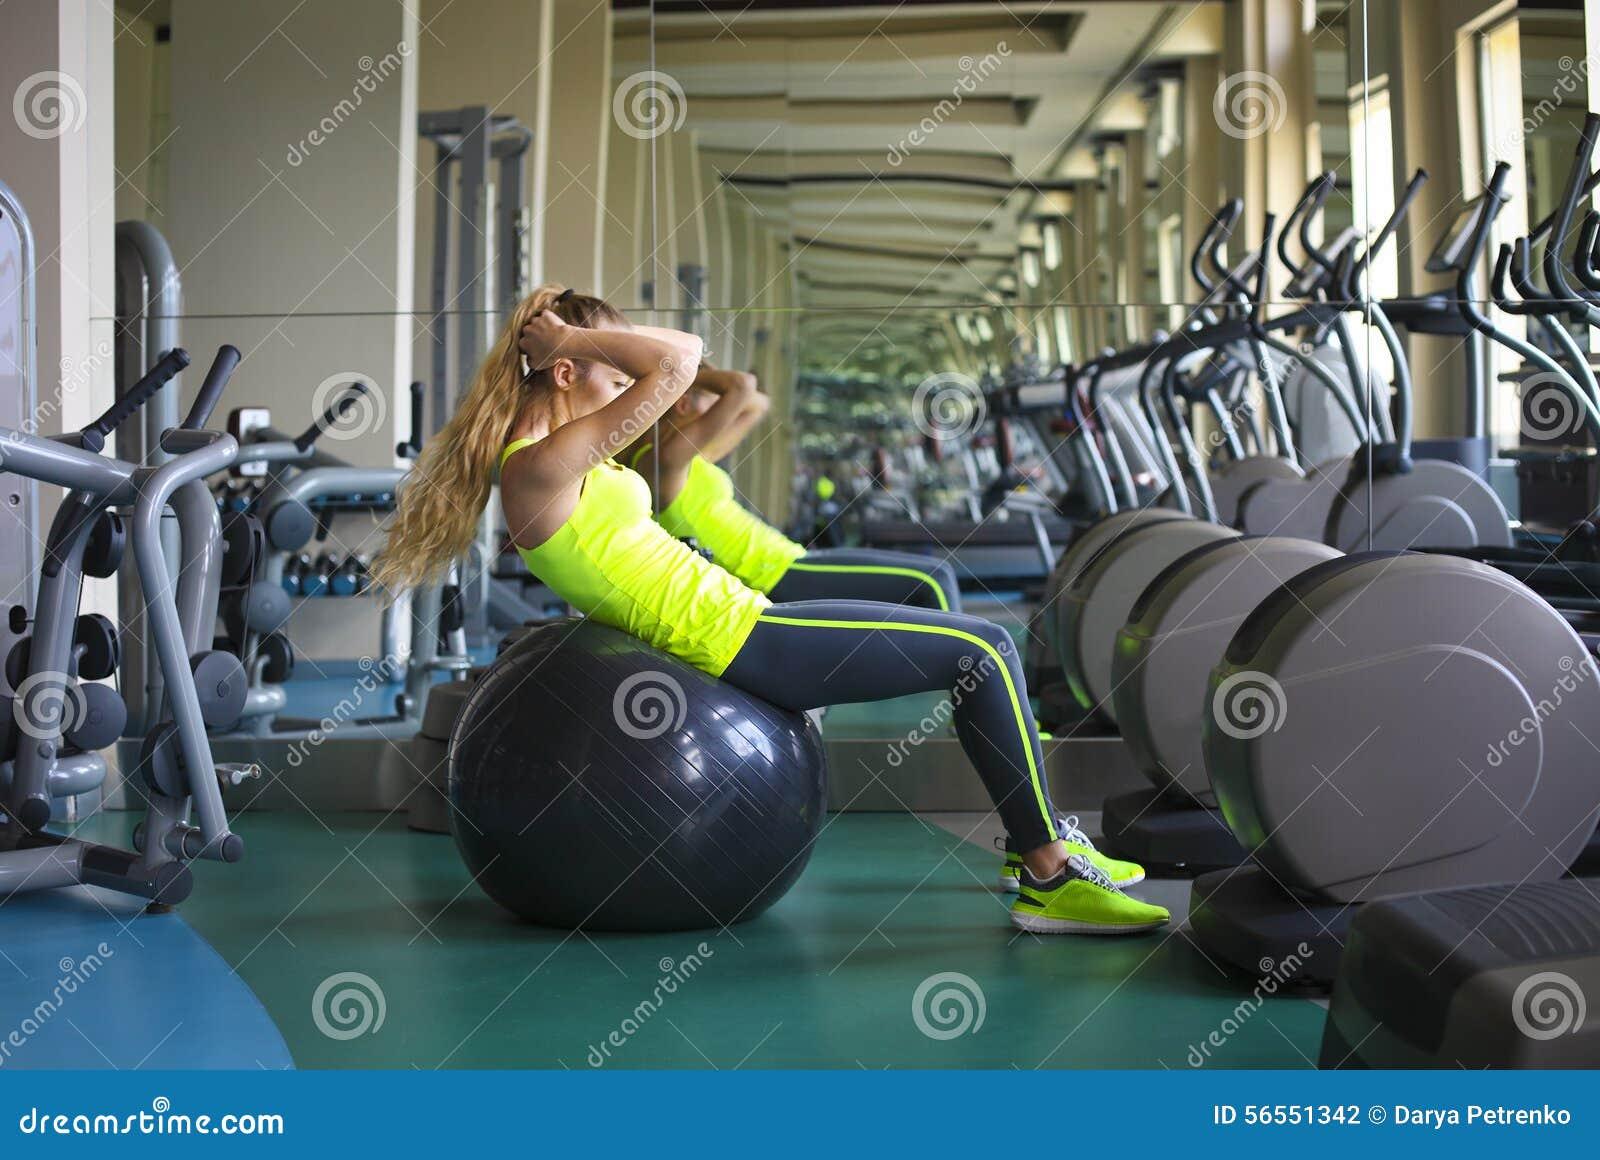 Download Νέα κατάλληλη γυναίκα που κάνει το κάθομαι-UPS στη σφαίρα άσκησης στη γυμναστική Στοκ Εικόνες - εικόνα από healthiness, θηλυκό: 56551342